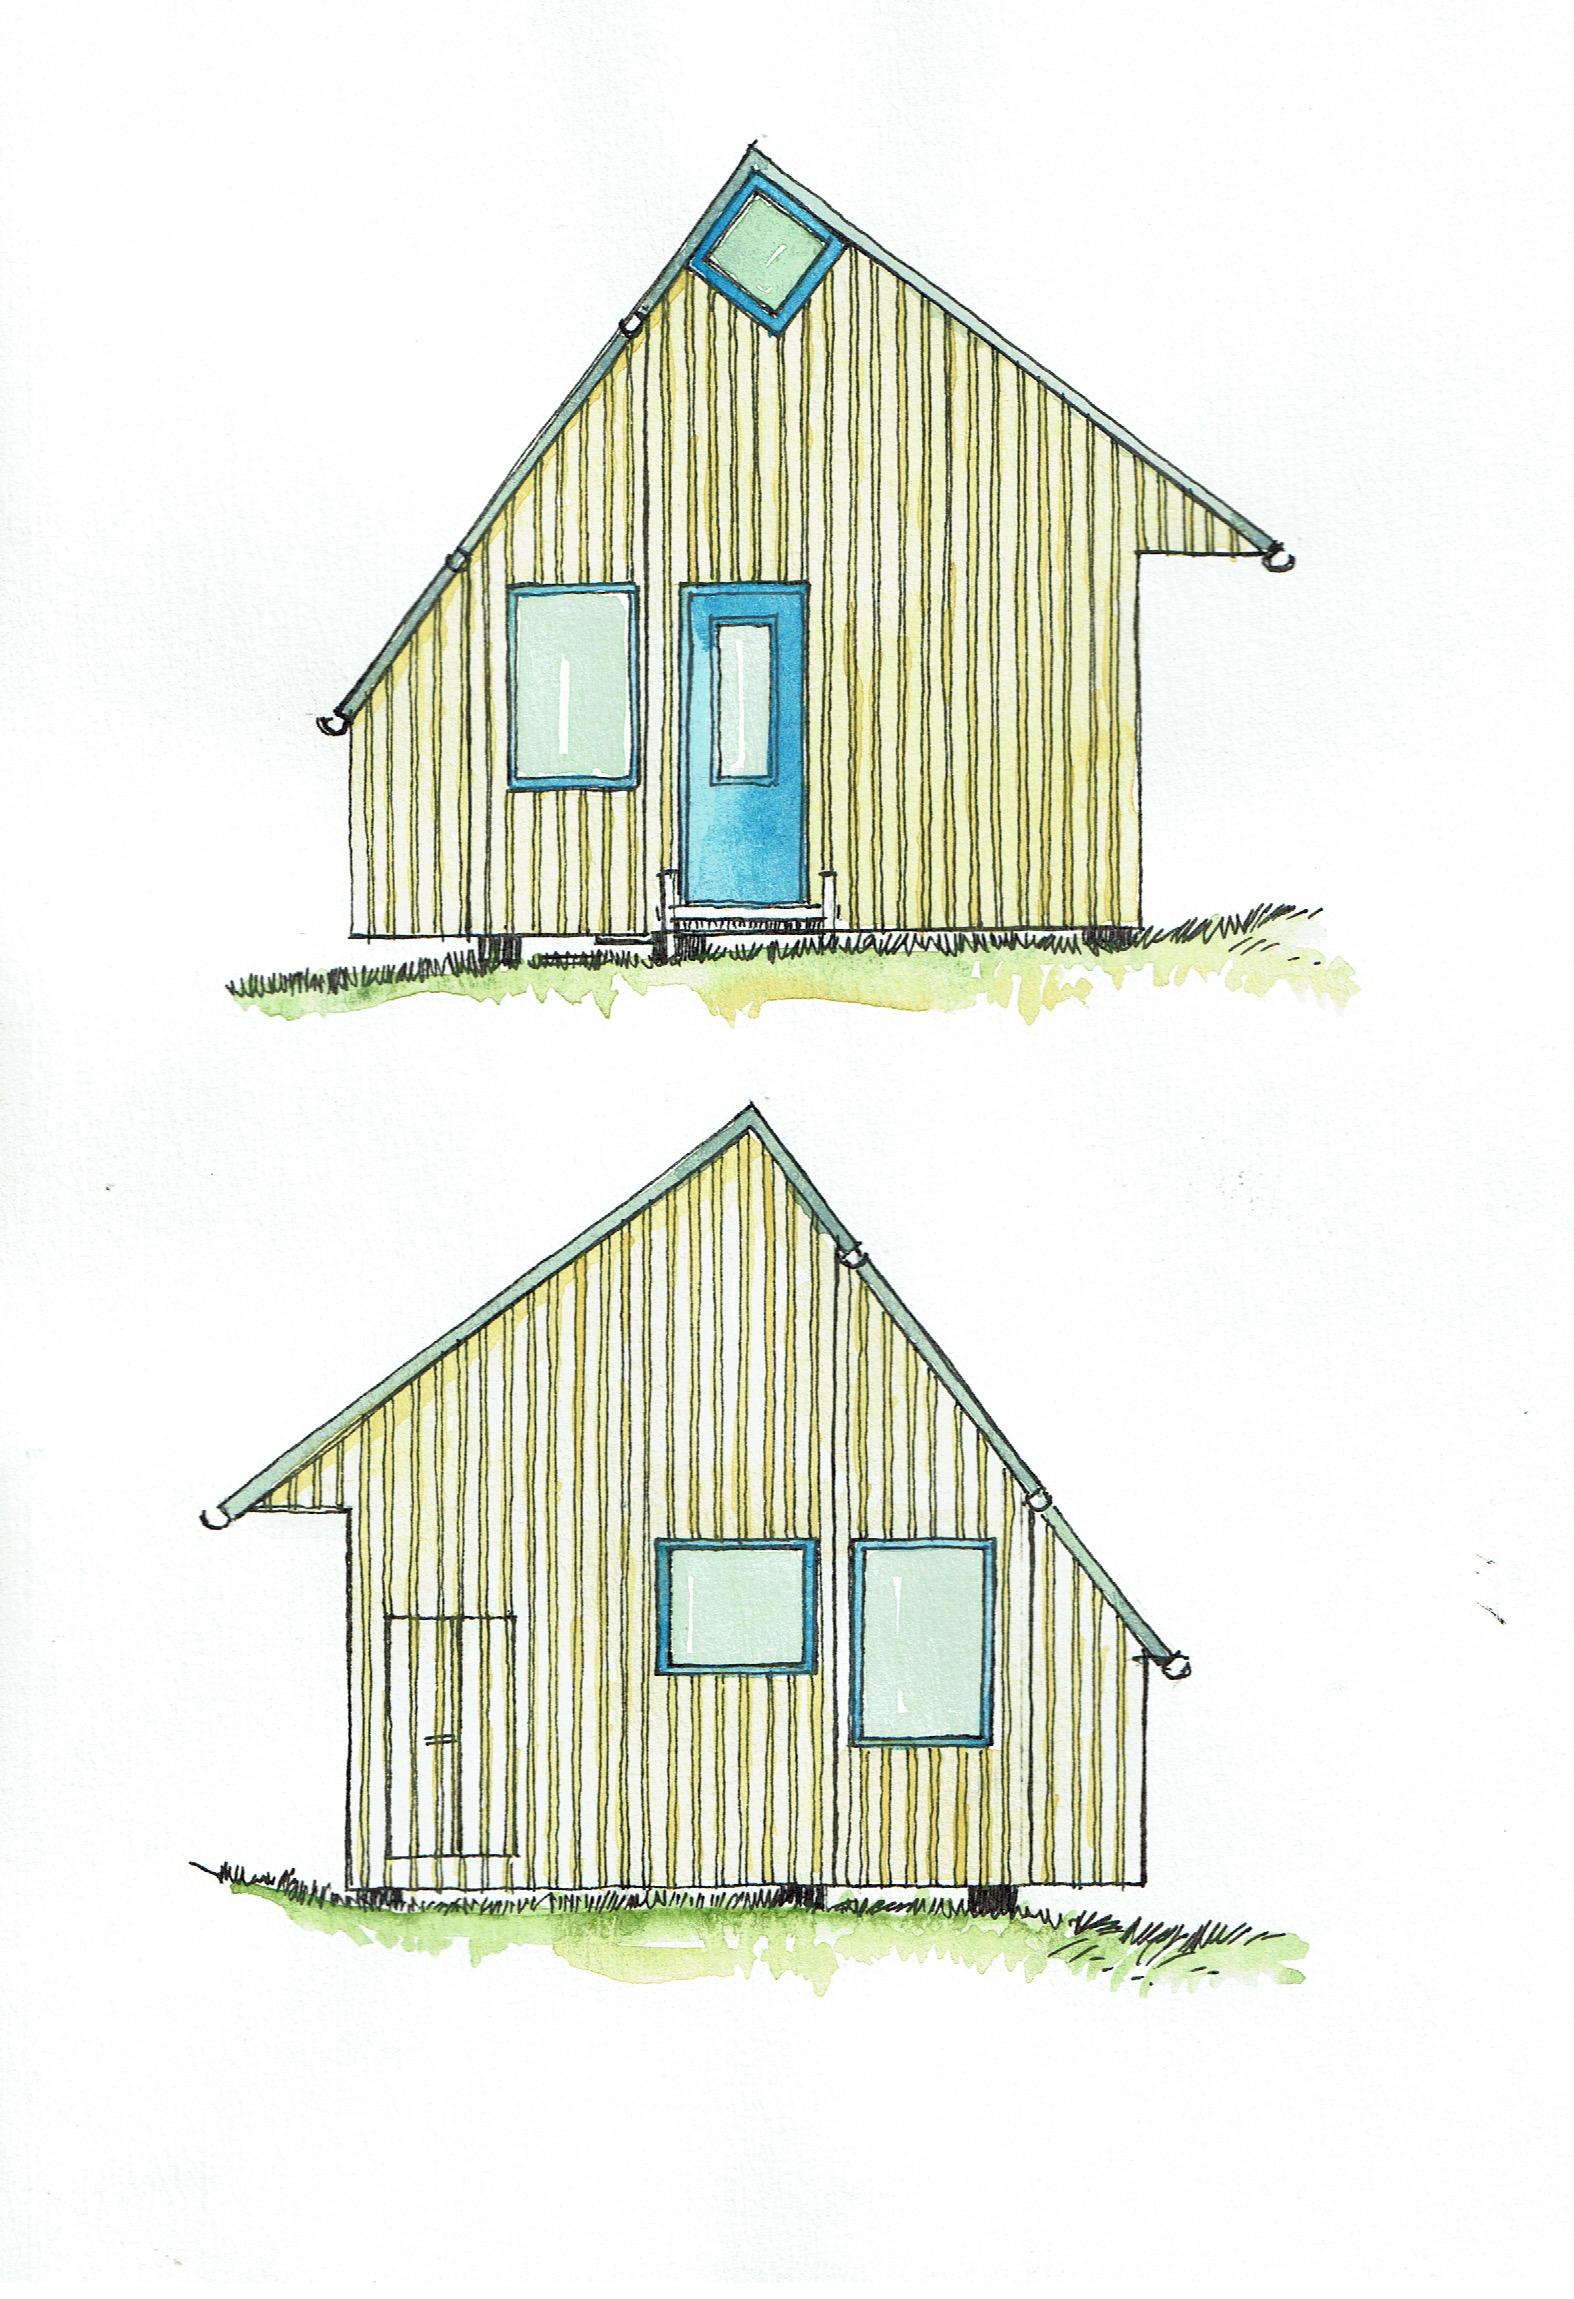 cabane_du_pecheur-facades.jpg